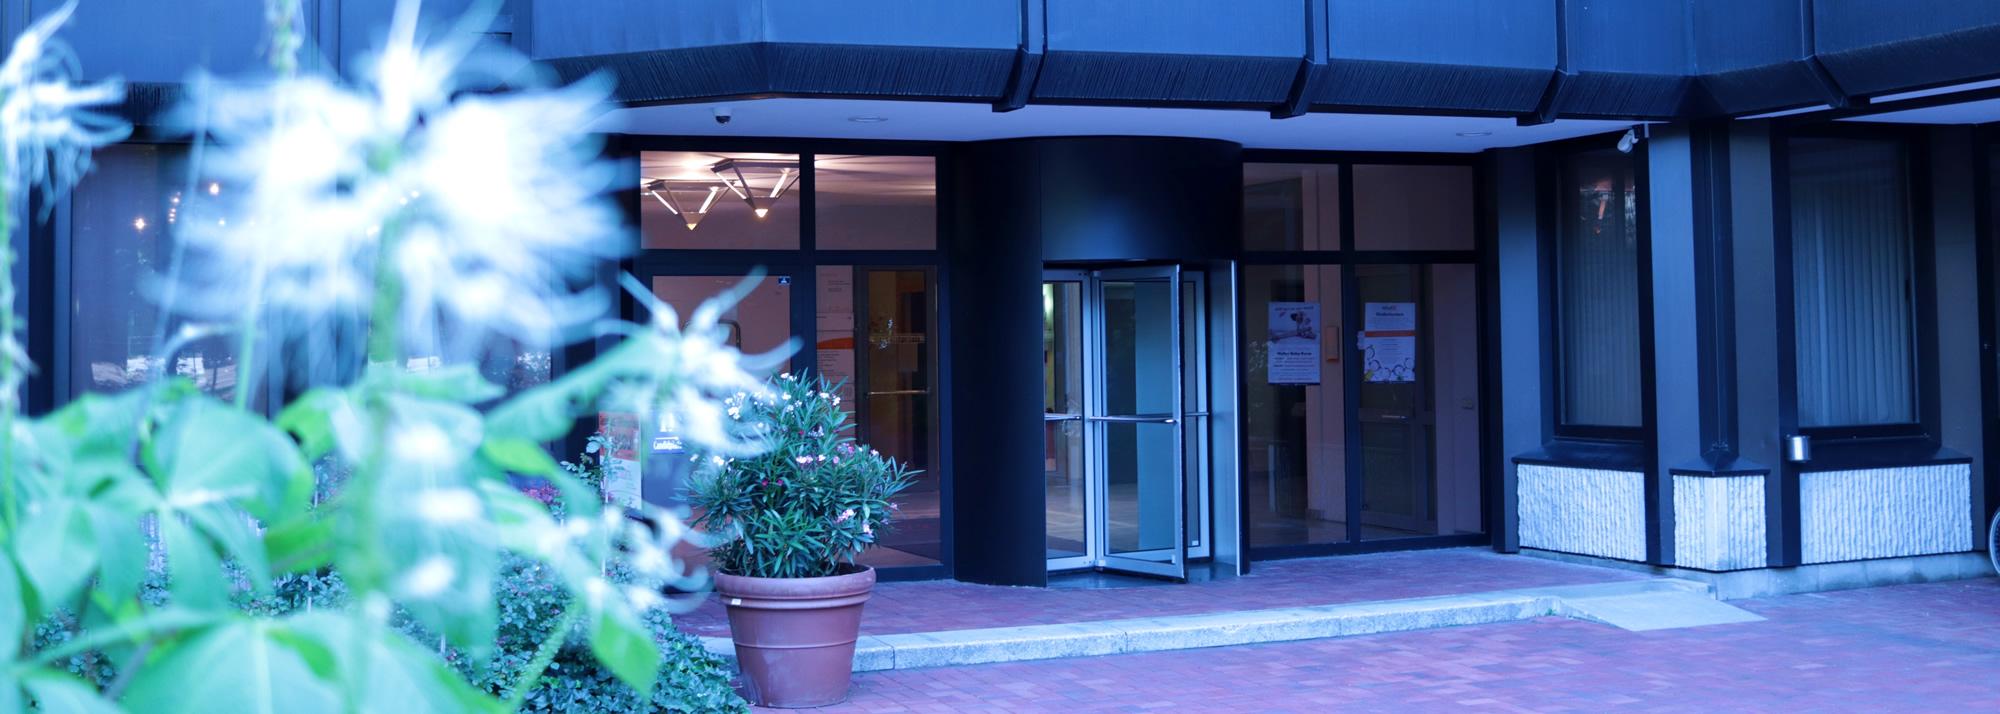 cutaris Zentrum Eingang